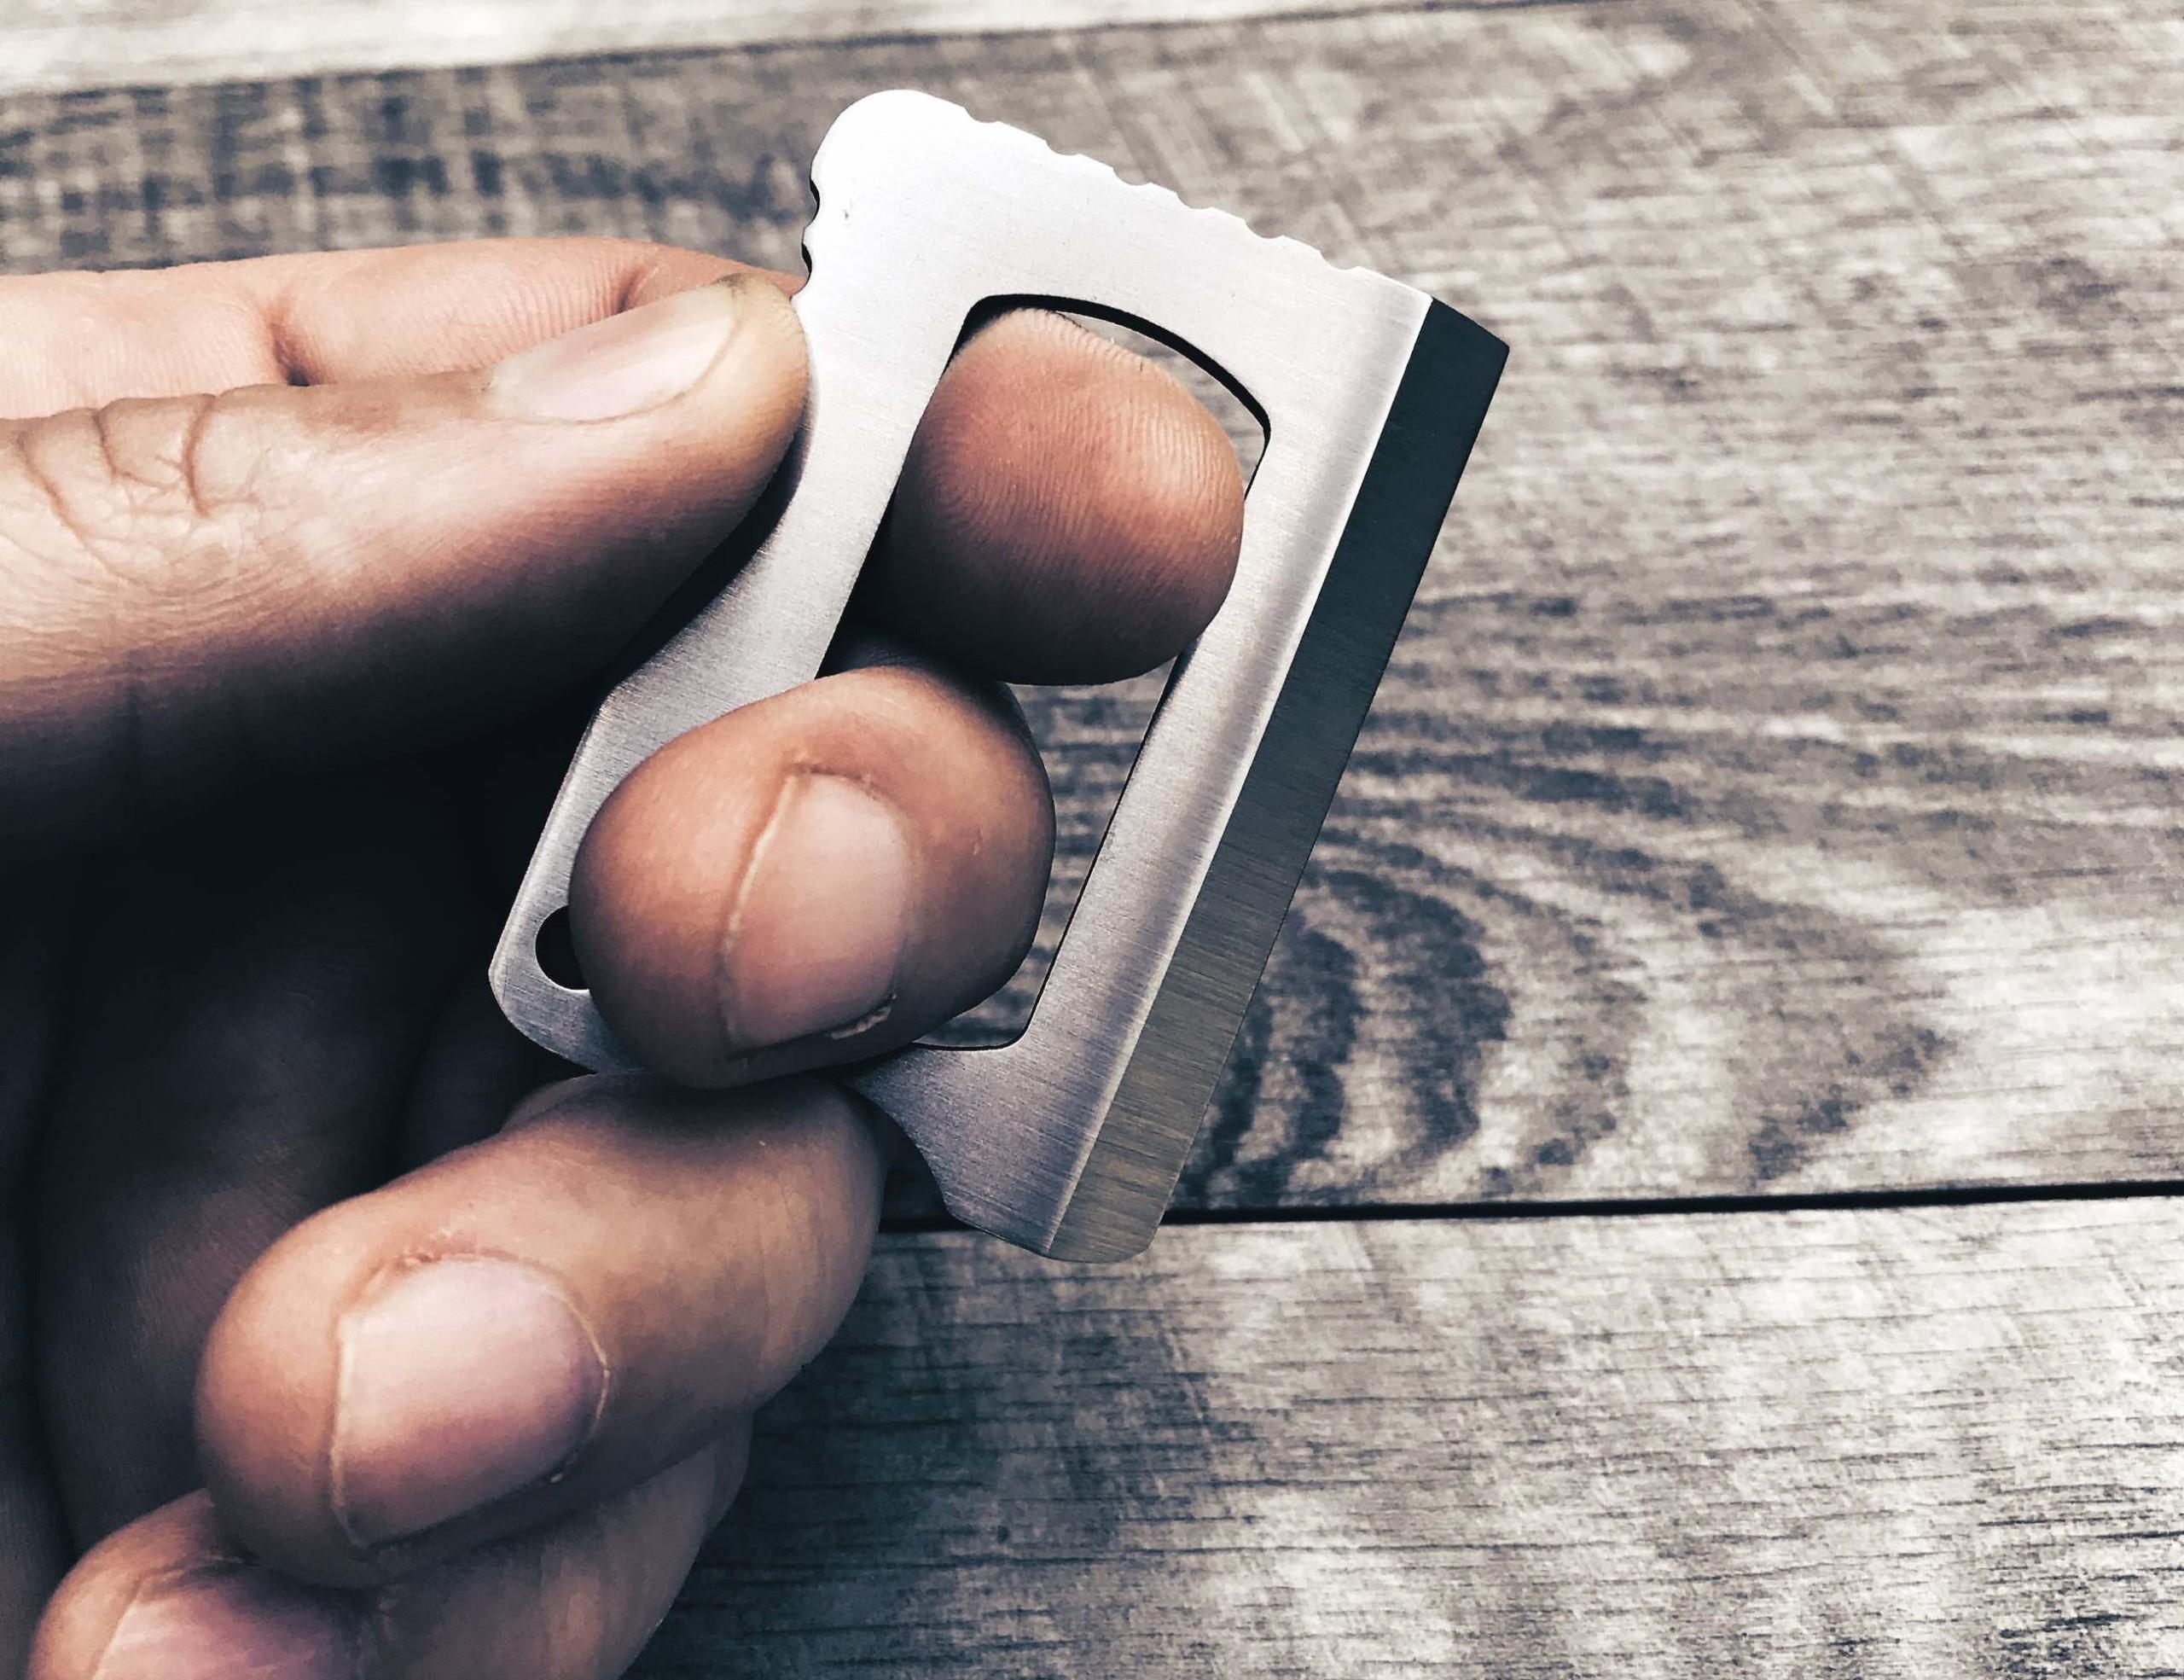 TRAK XL Compact Utility Knife